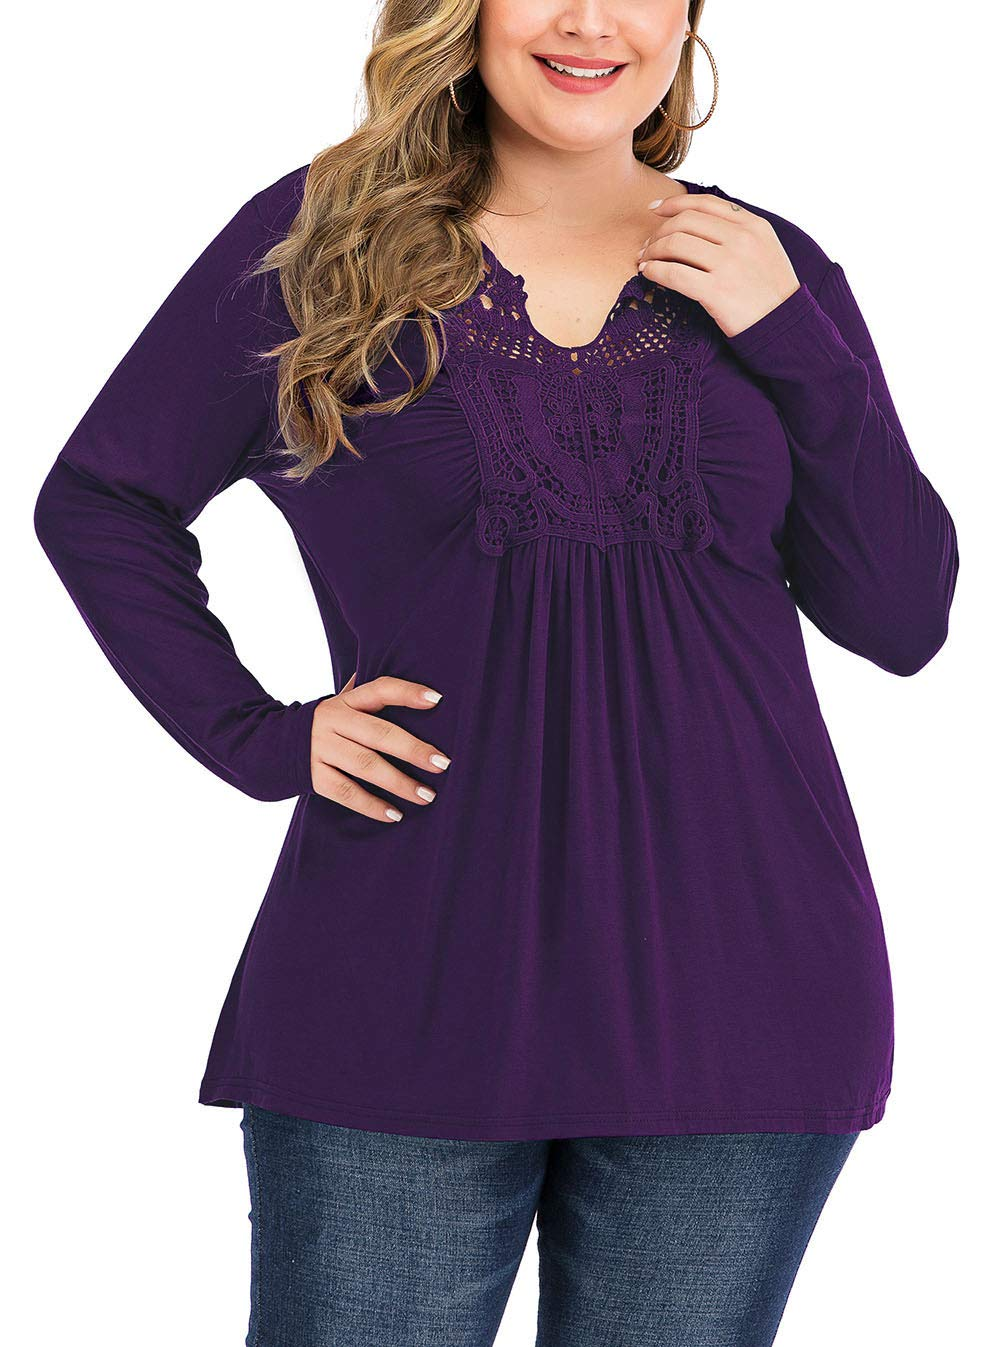 YASAKO Womens Pleated Tops Plus Size V-Neck Lace Blouse Swing T-Shirts Flowy Long Sleeve Casual Tunic,Purple,3XL